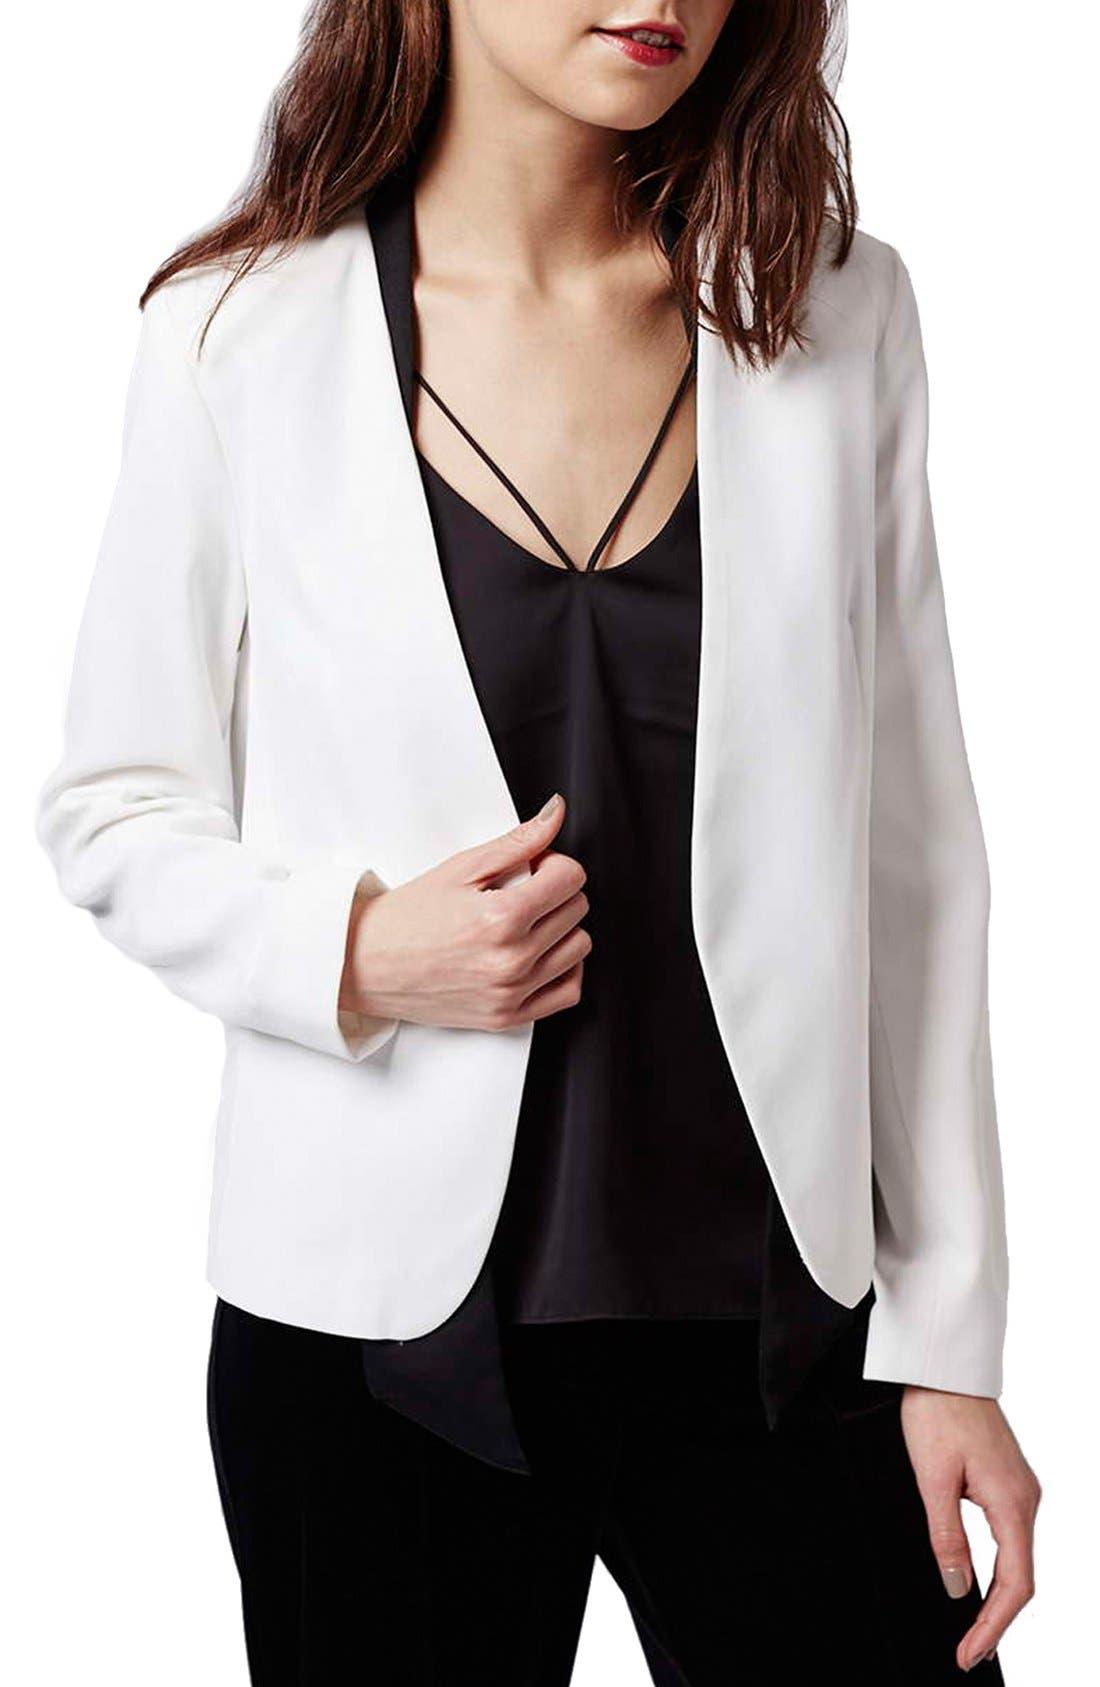 Alternate Image 1 Selected - Topshop Neck Tie Tuxedo Jacket